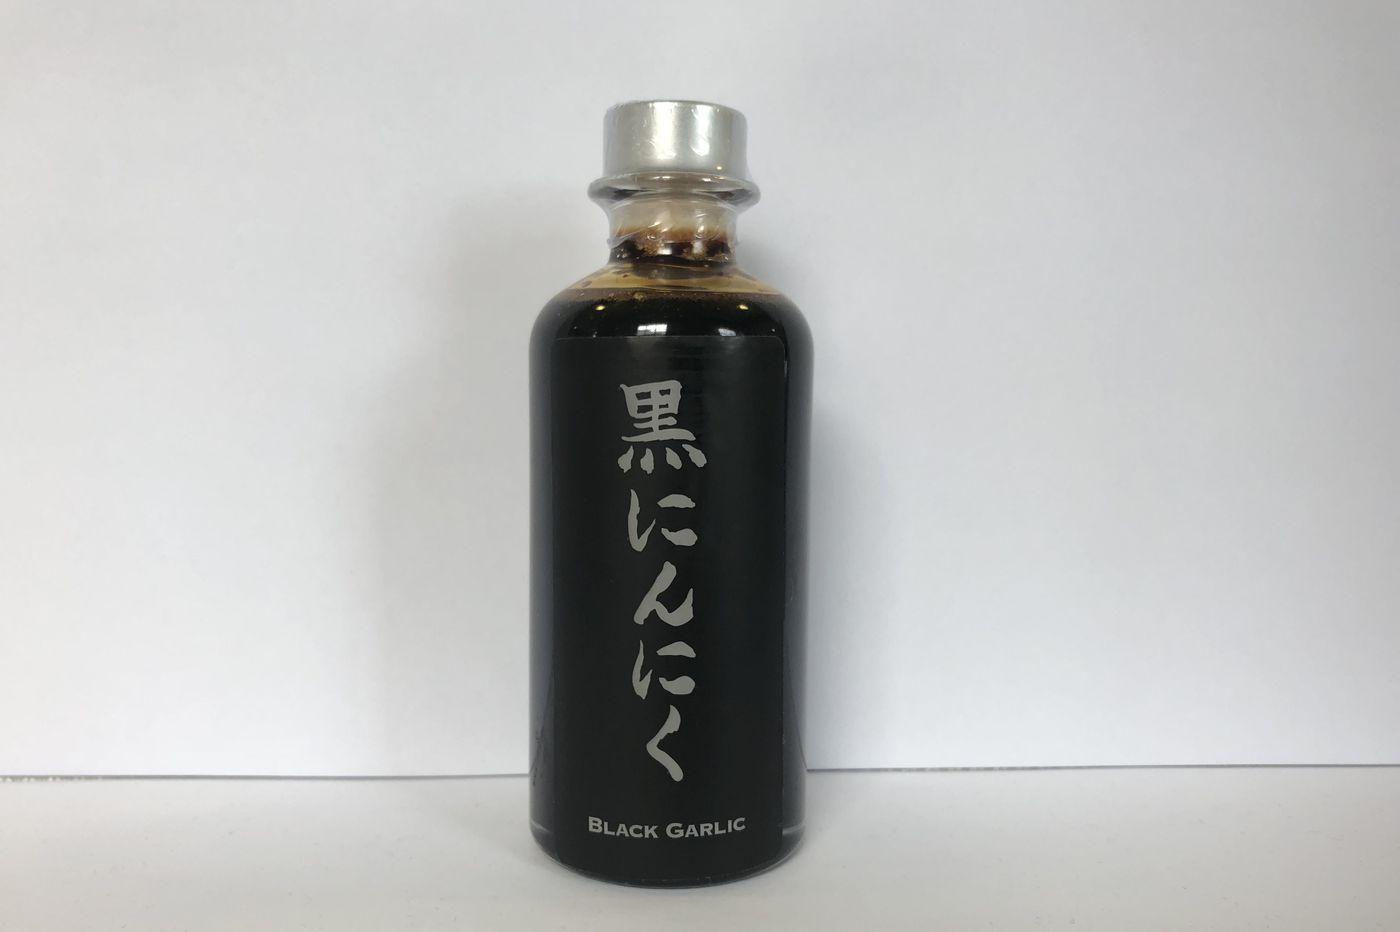 Black garlic molasses is big in Japan